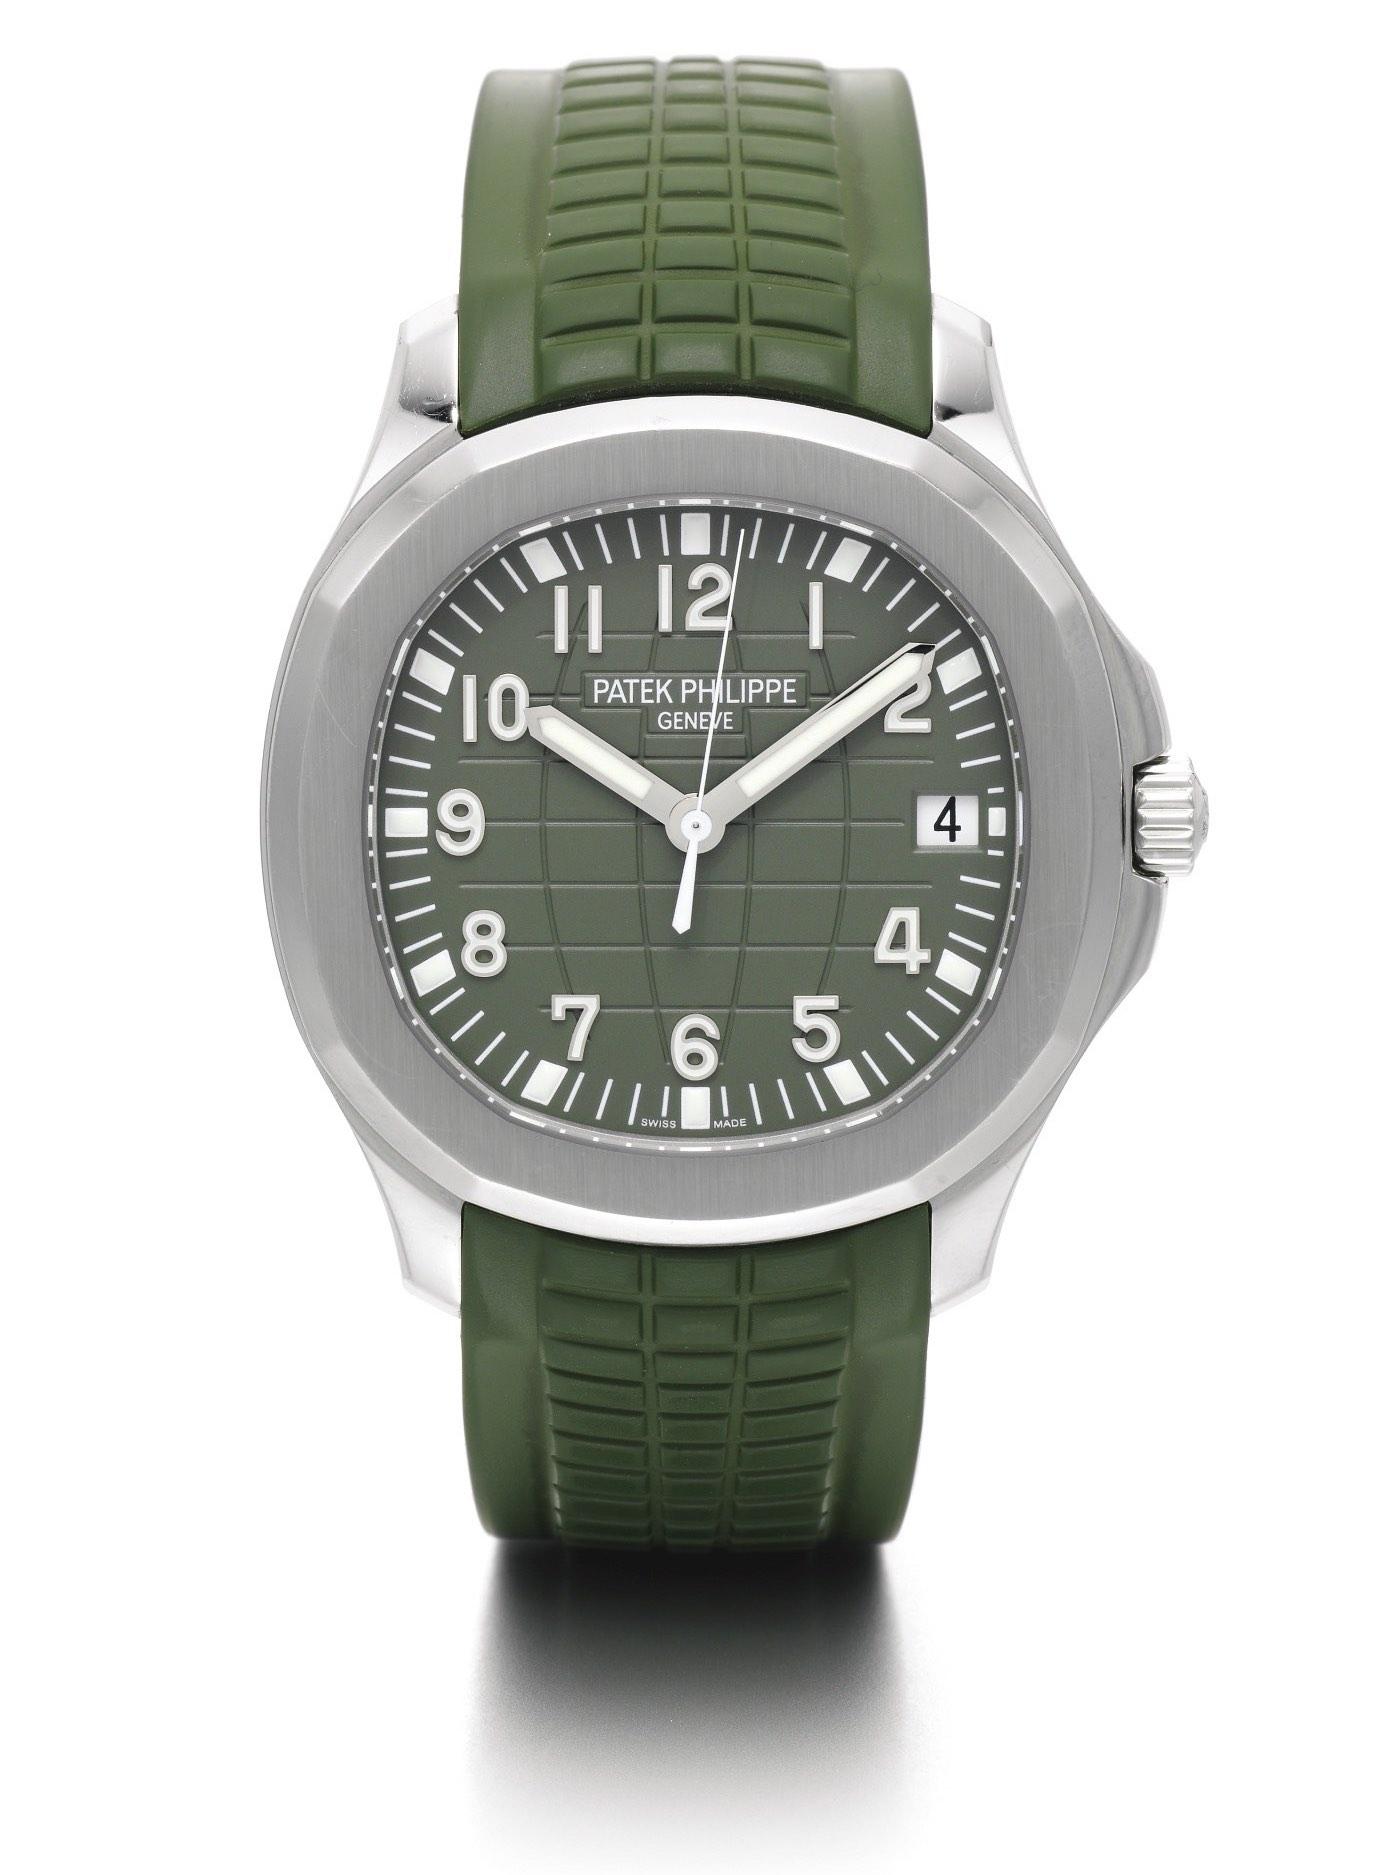 Patek Philippe Aquanaut 5167A-010 steel khaki green dial strap - photo by sothebys